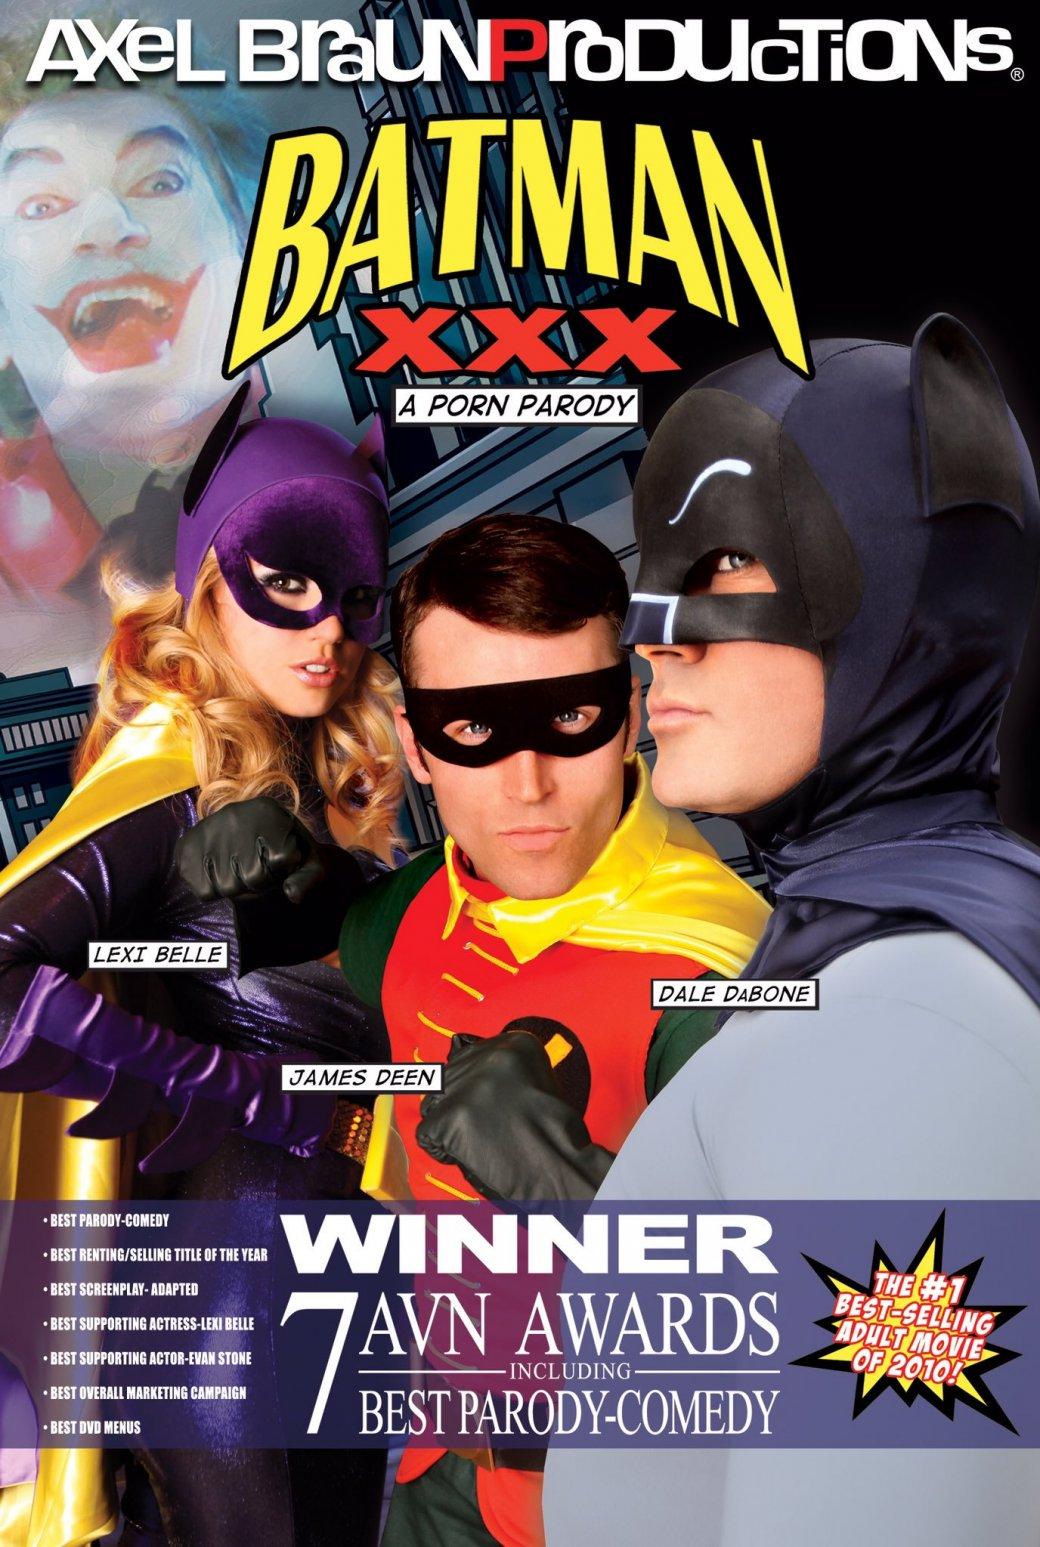 Batman XXX A Porn Parody Full USA 18+ Adult Movie Online Free